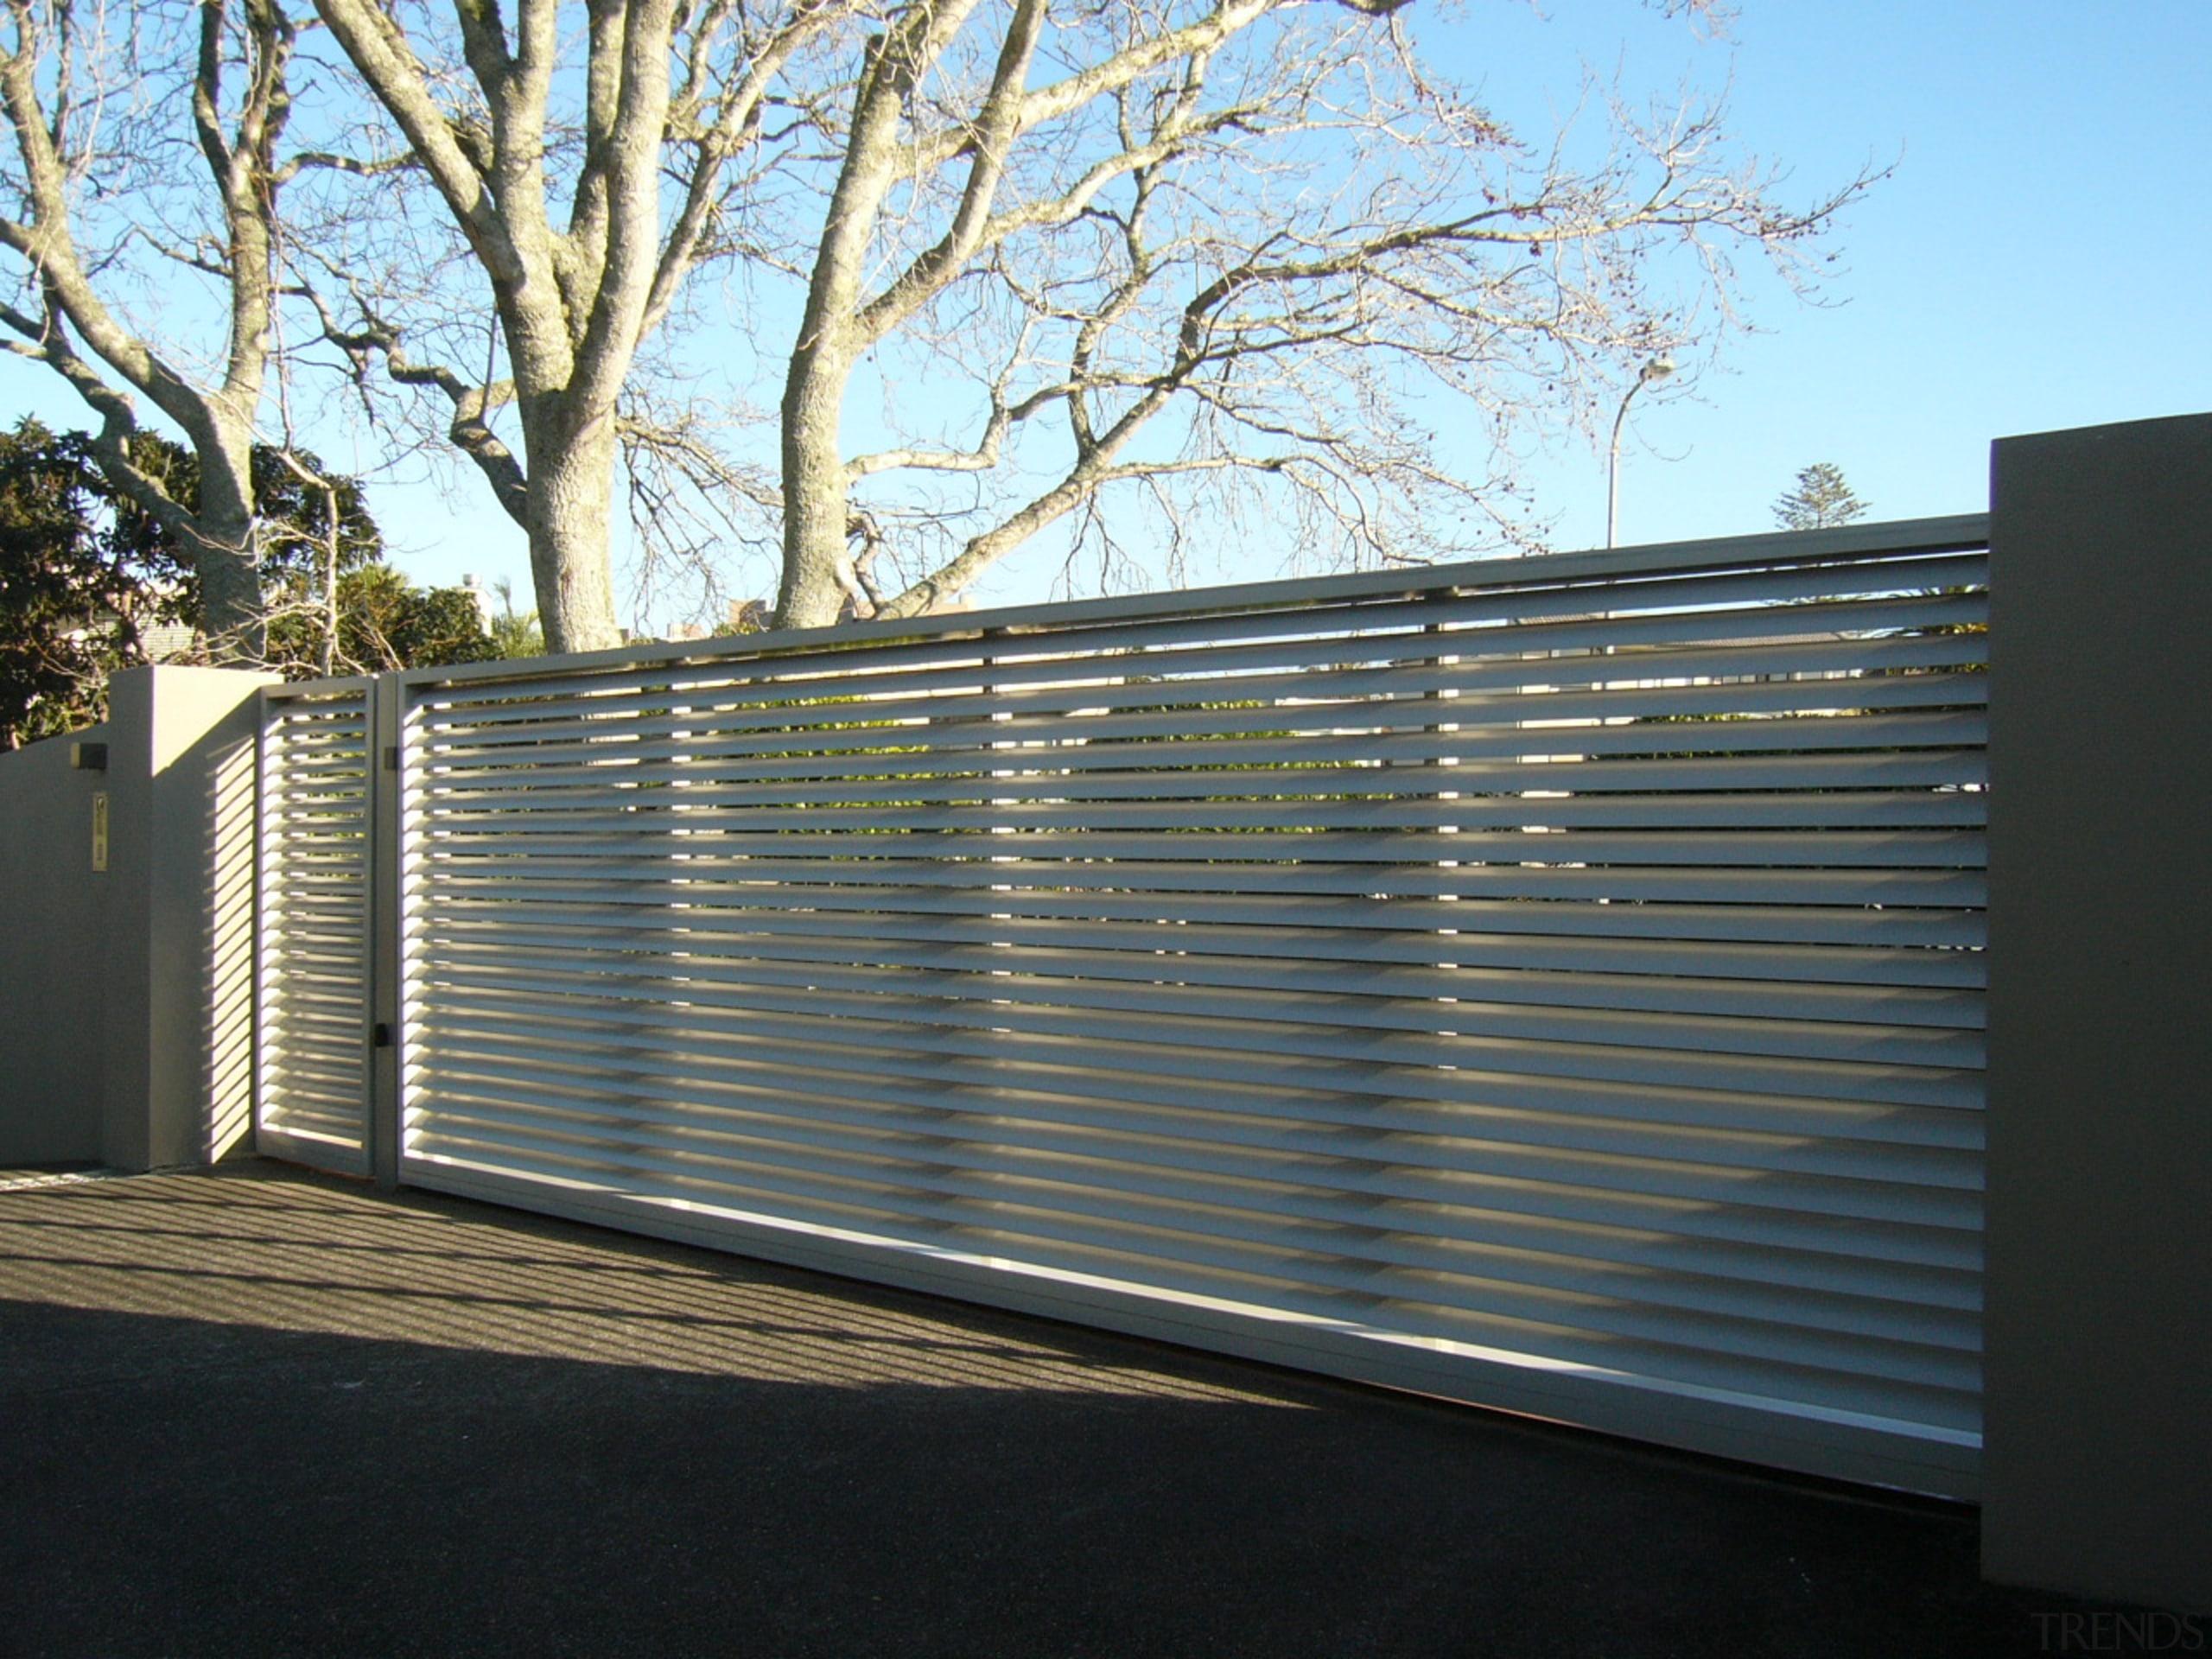 78580_louvretec-new-zealand-ltd_1556758110 - aluminium | architecture | daylighting | aluminium, architecture, daylighting, facade, fence, gate, home fencing, line, material property, metal, real estate, wall, black, gray